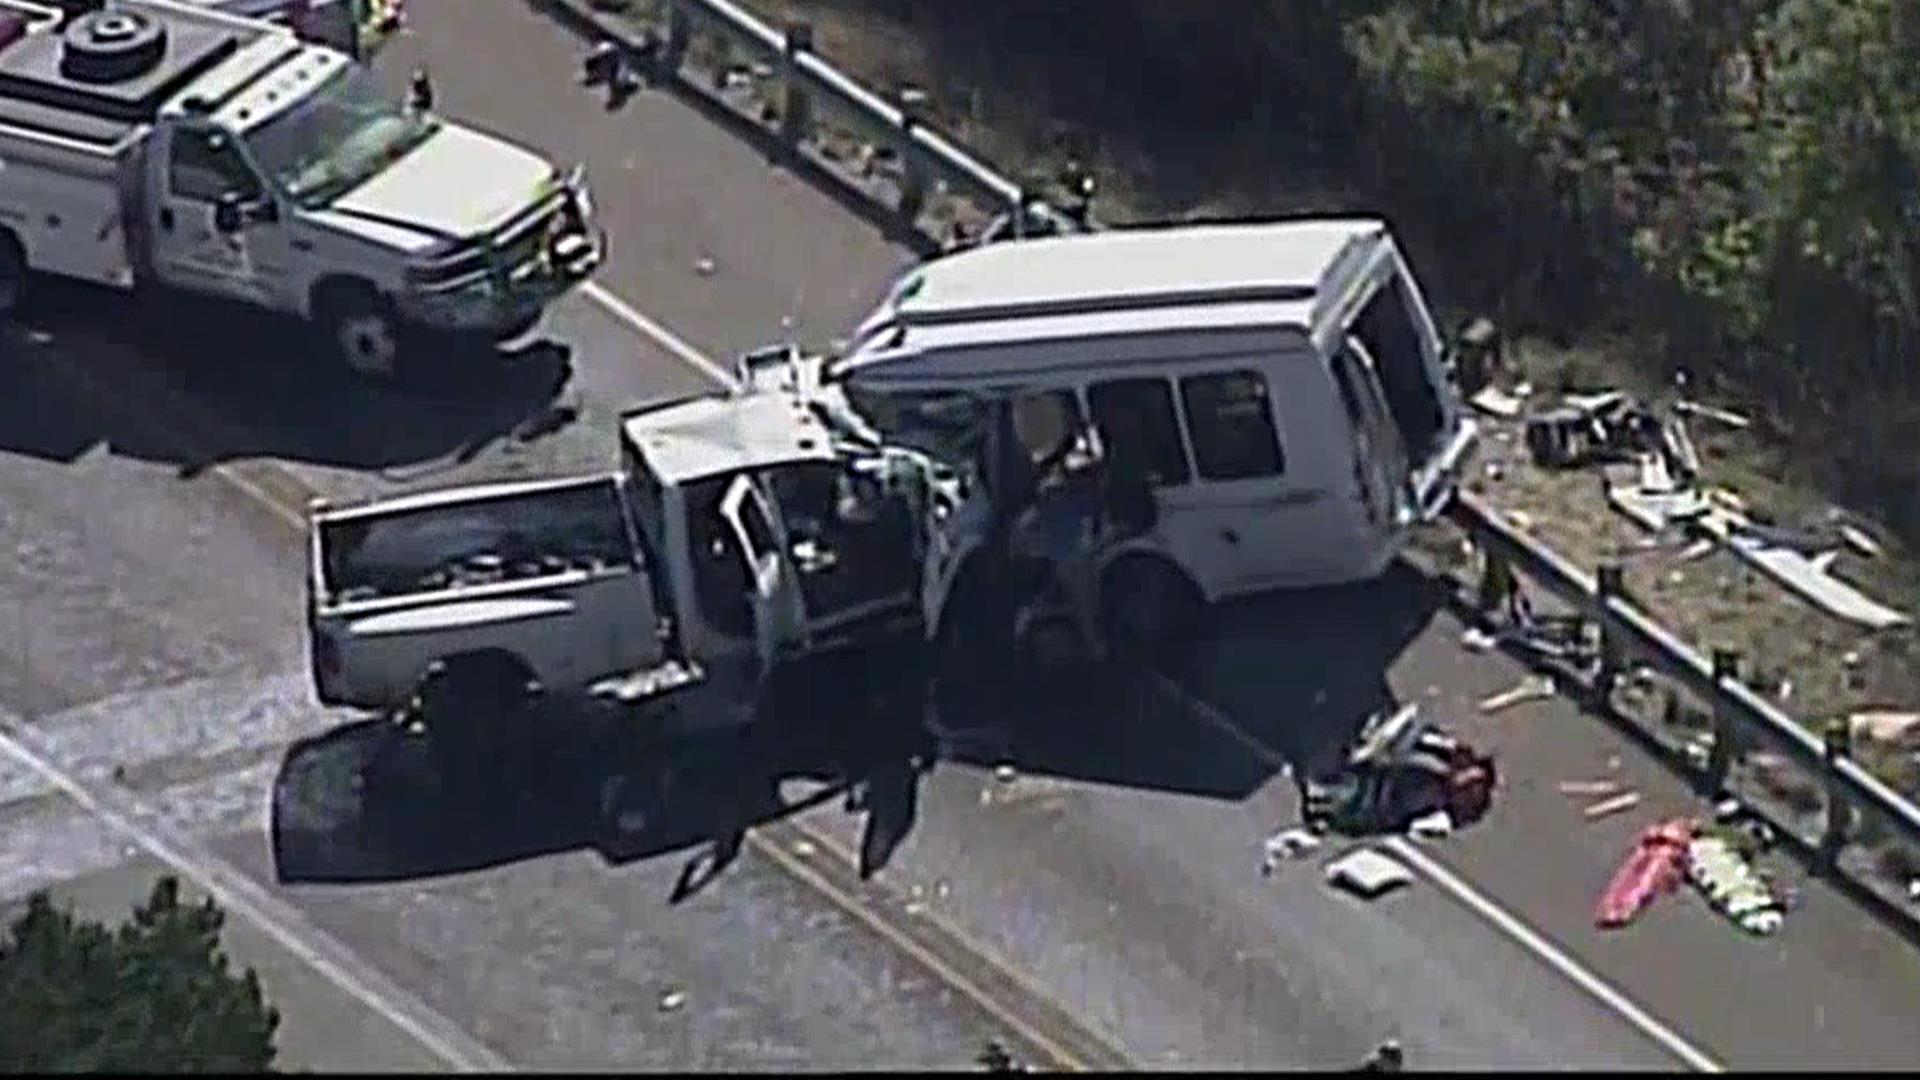 12 people die in church bus crash in Concan, Texas - NBC News